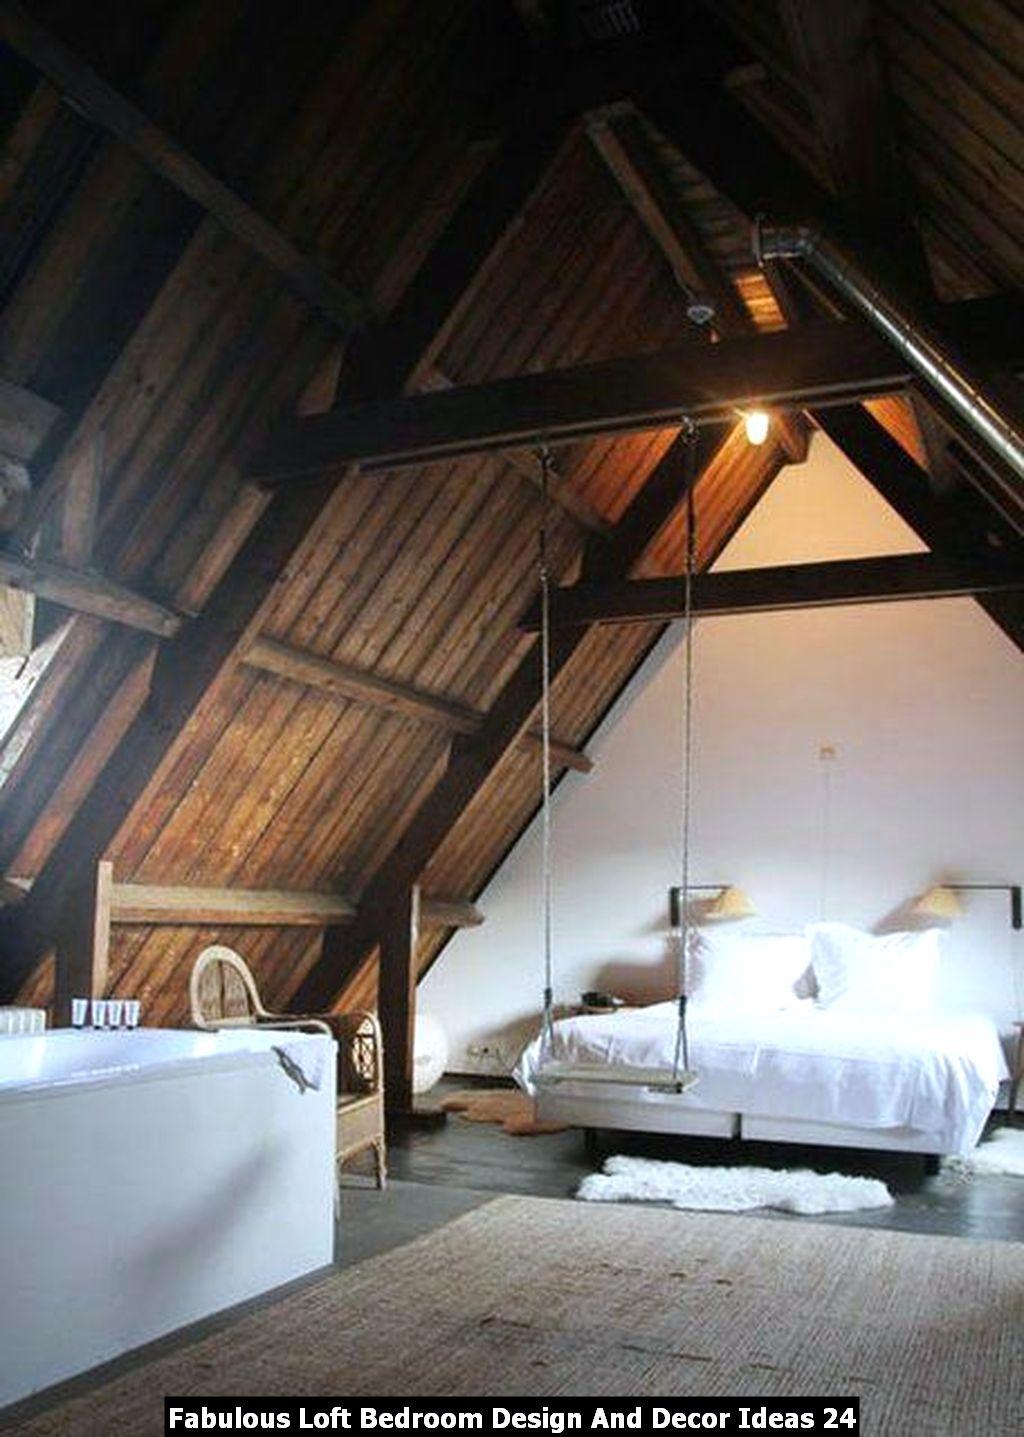 Fabulous Loft Bedroom Design And Decor Ideas 24